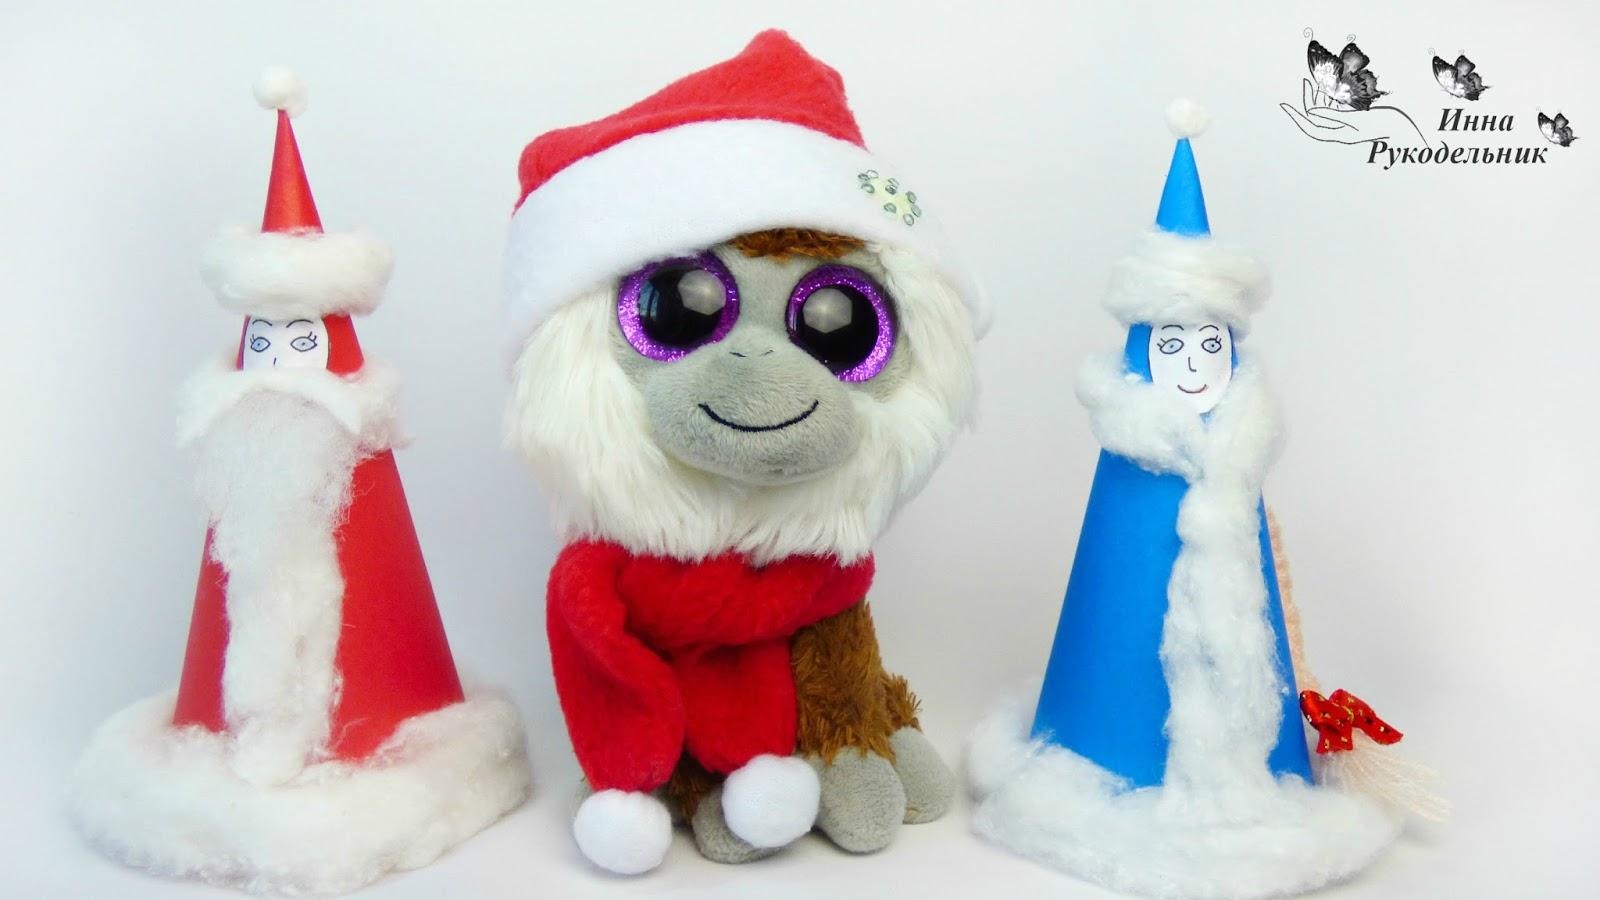 Дед мороз и снегурочка своими руками из бумаги